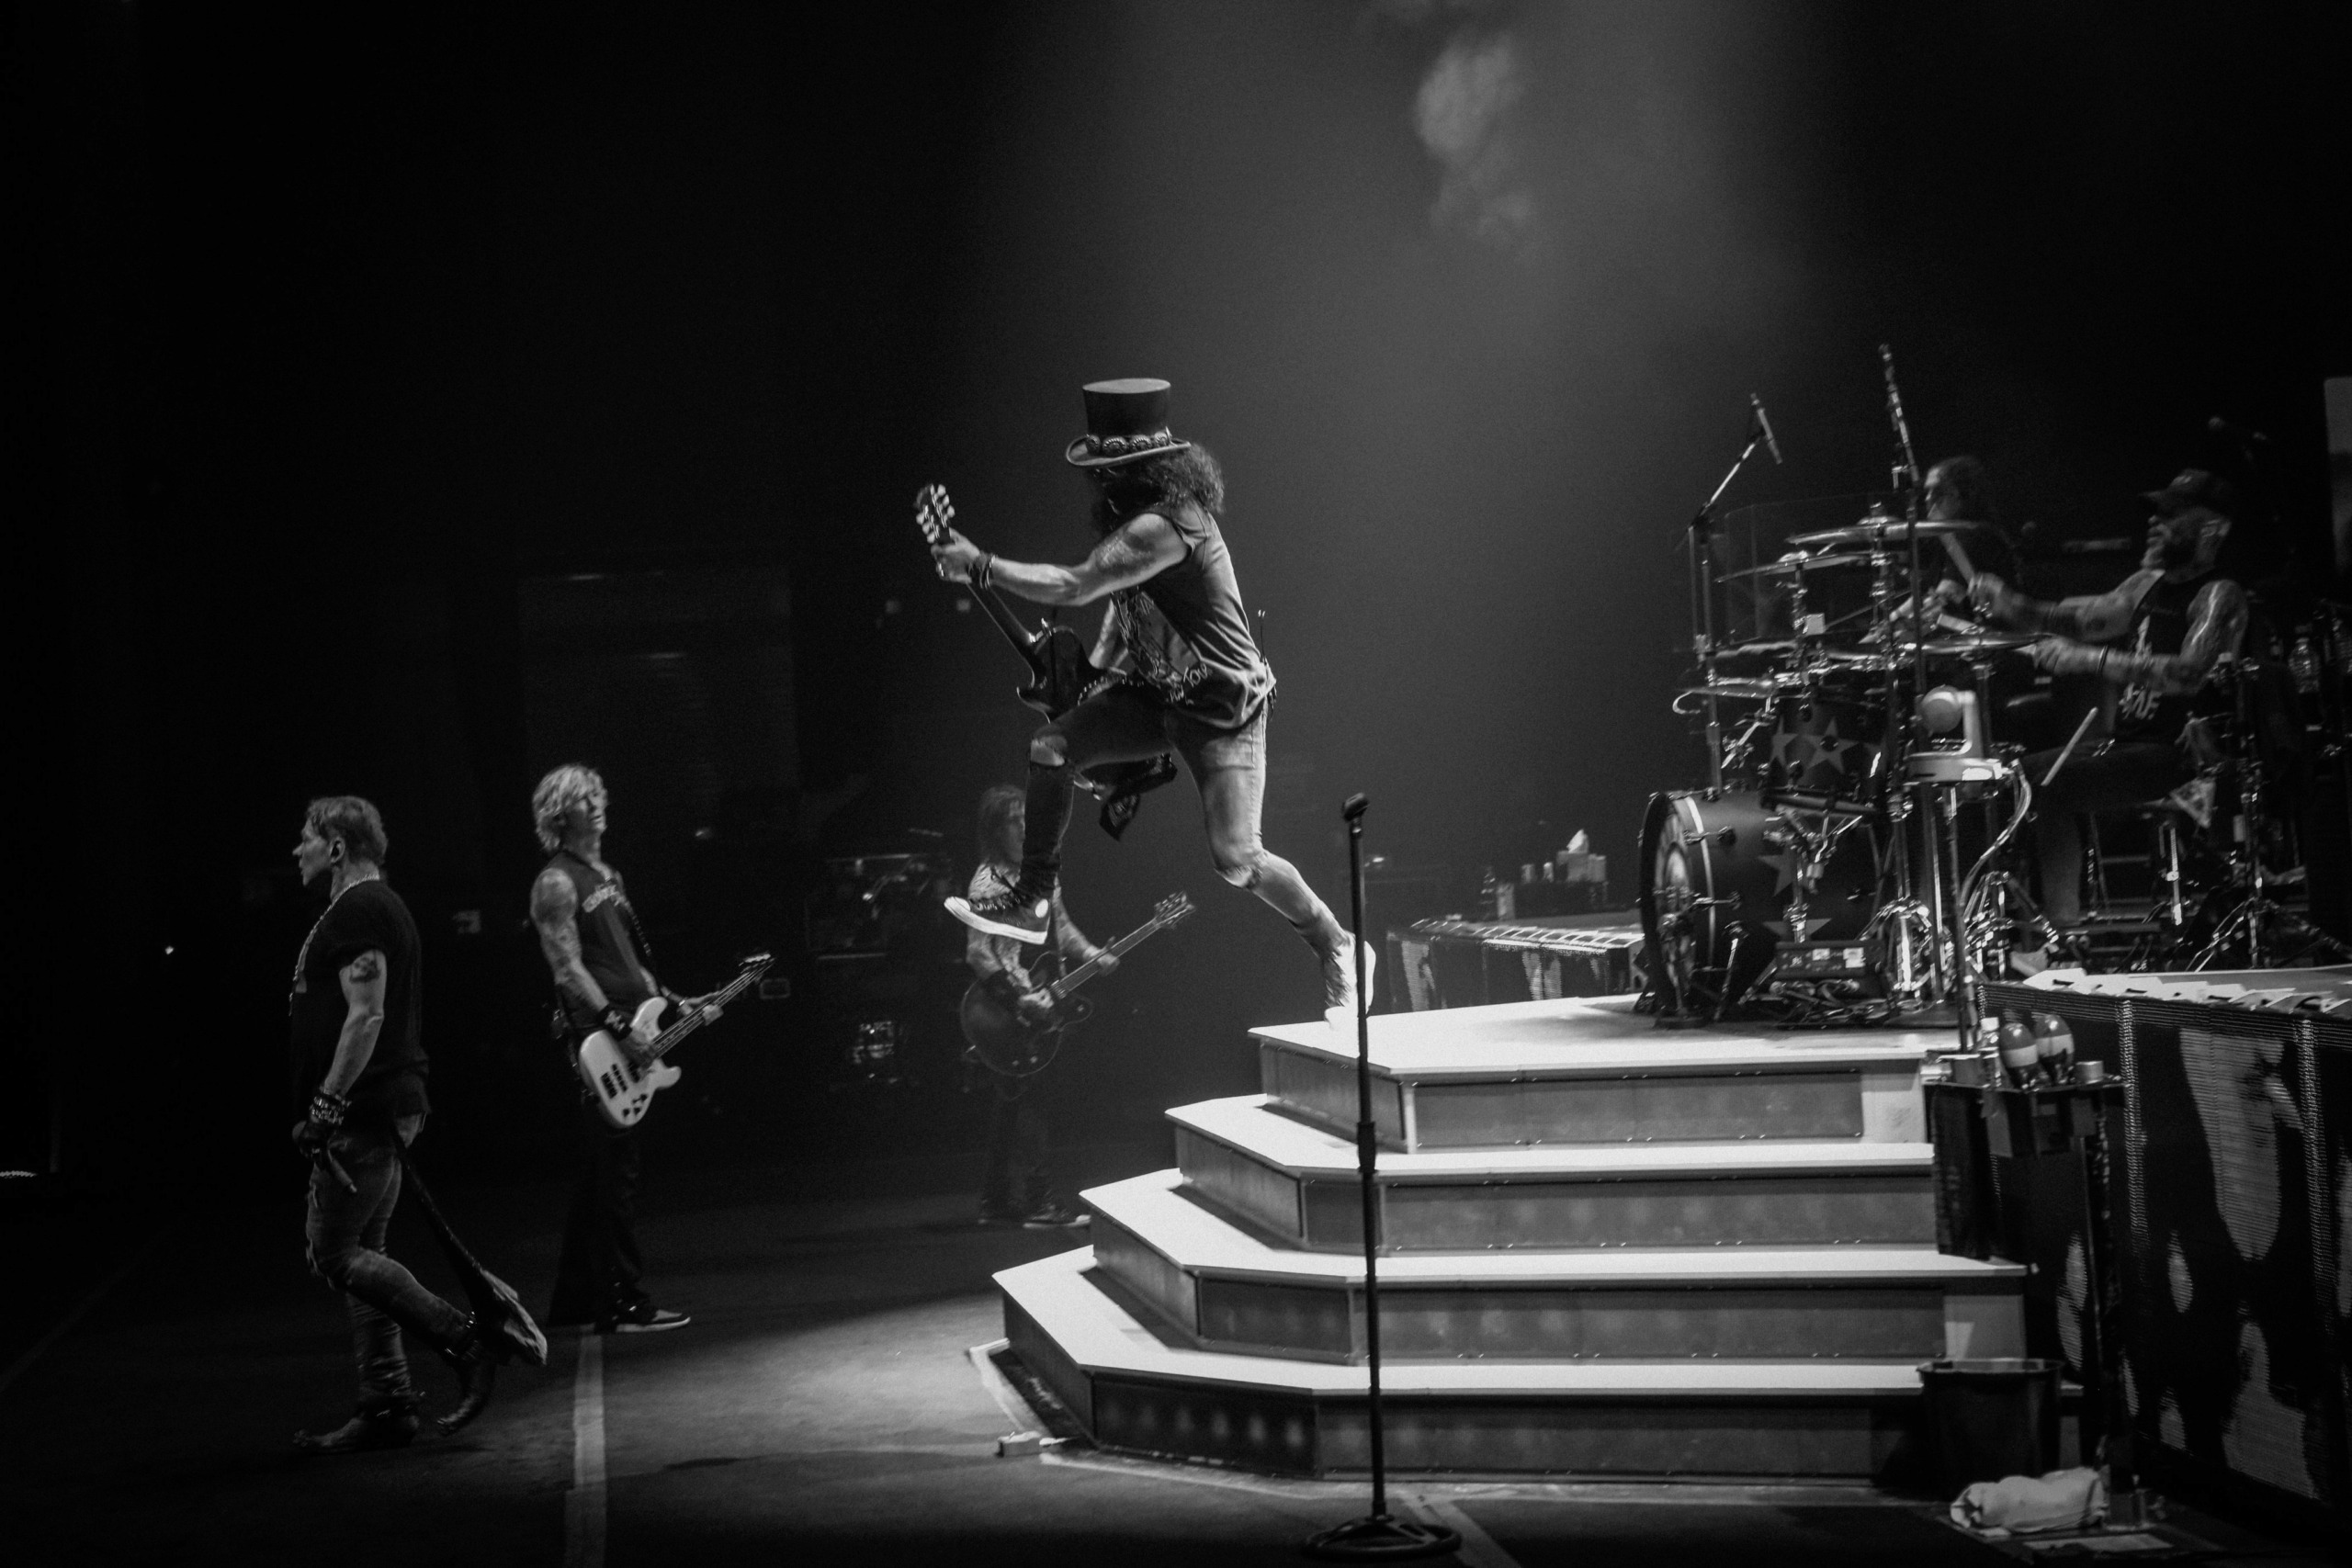 2021.10.03 - Hard Rock Live Arena, Hollywood, FL, USA. Fbrwqk10